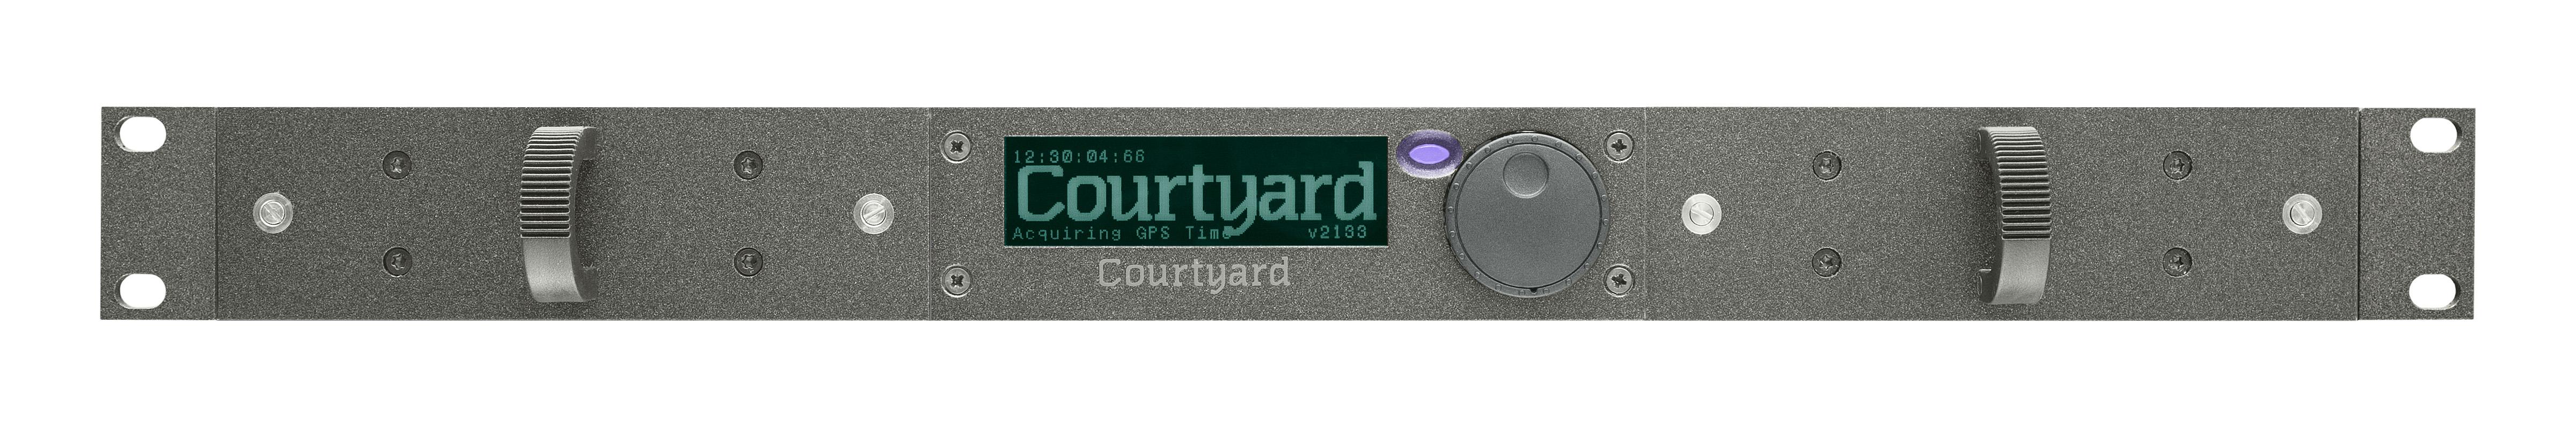 Courtyard_1